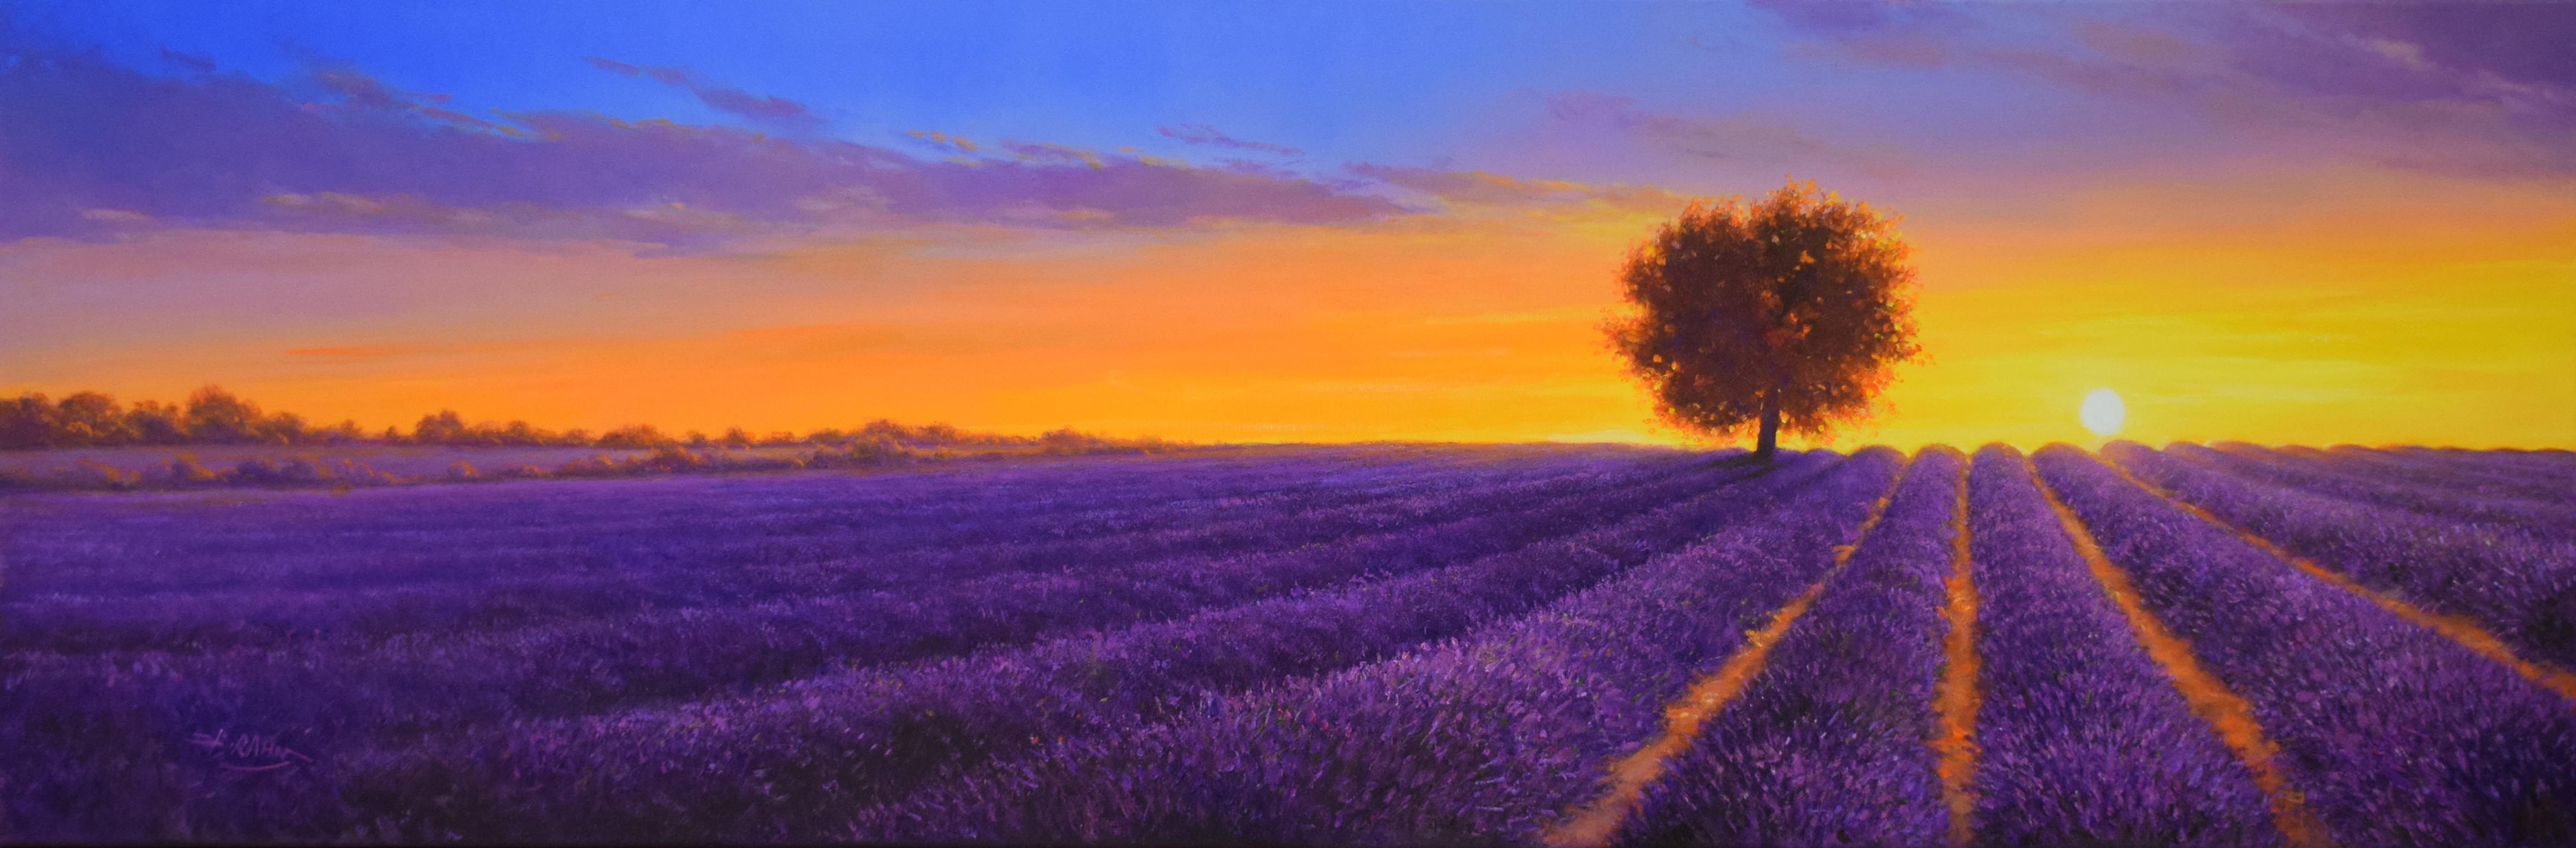 Detlef Rahn - Lavendelfeld, Provence , 7840-006-988